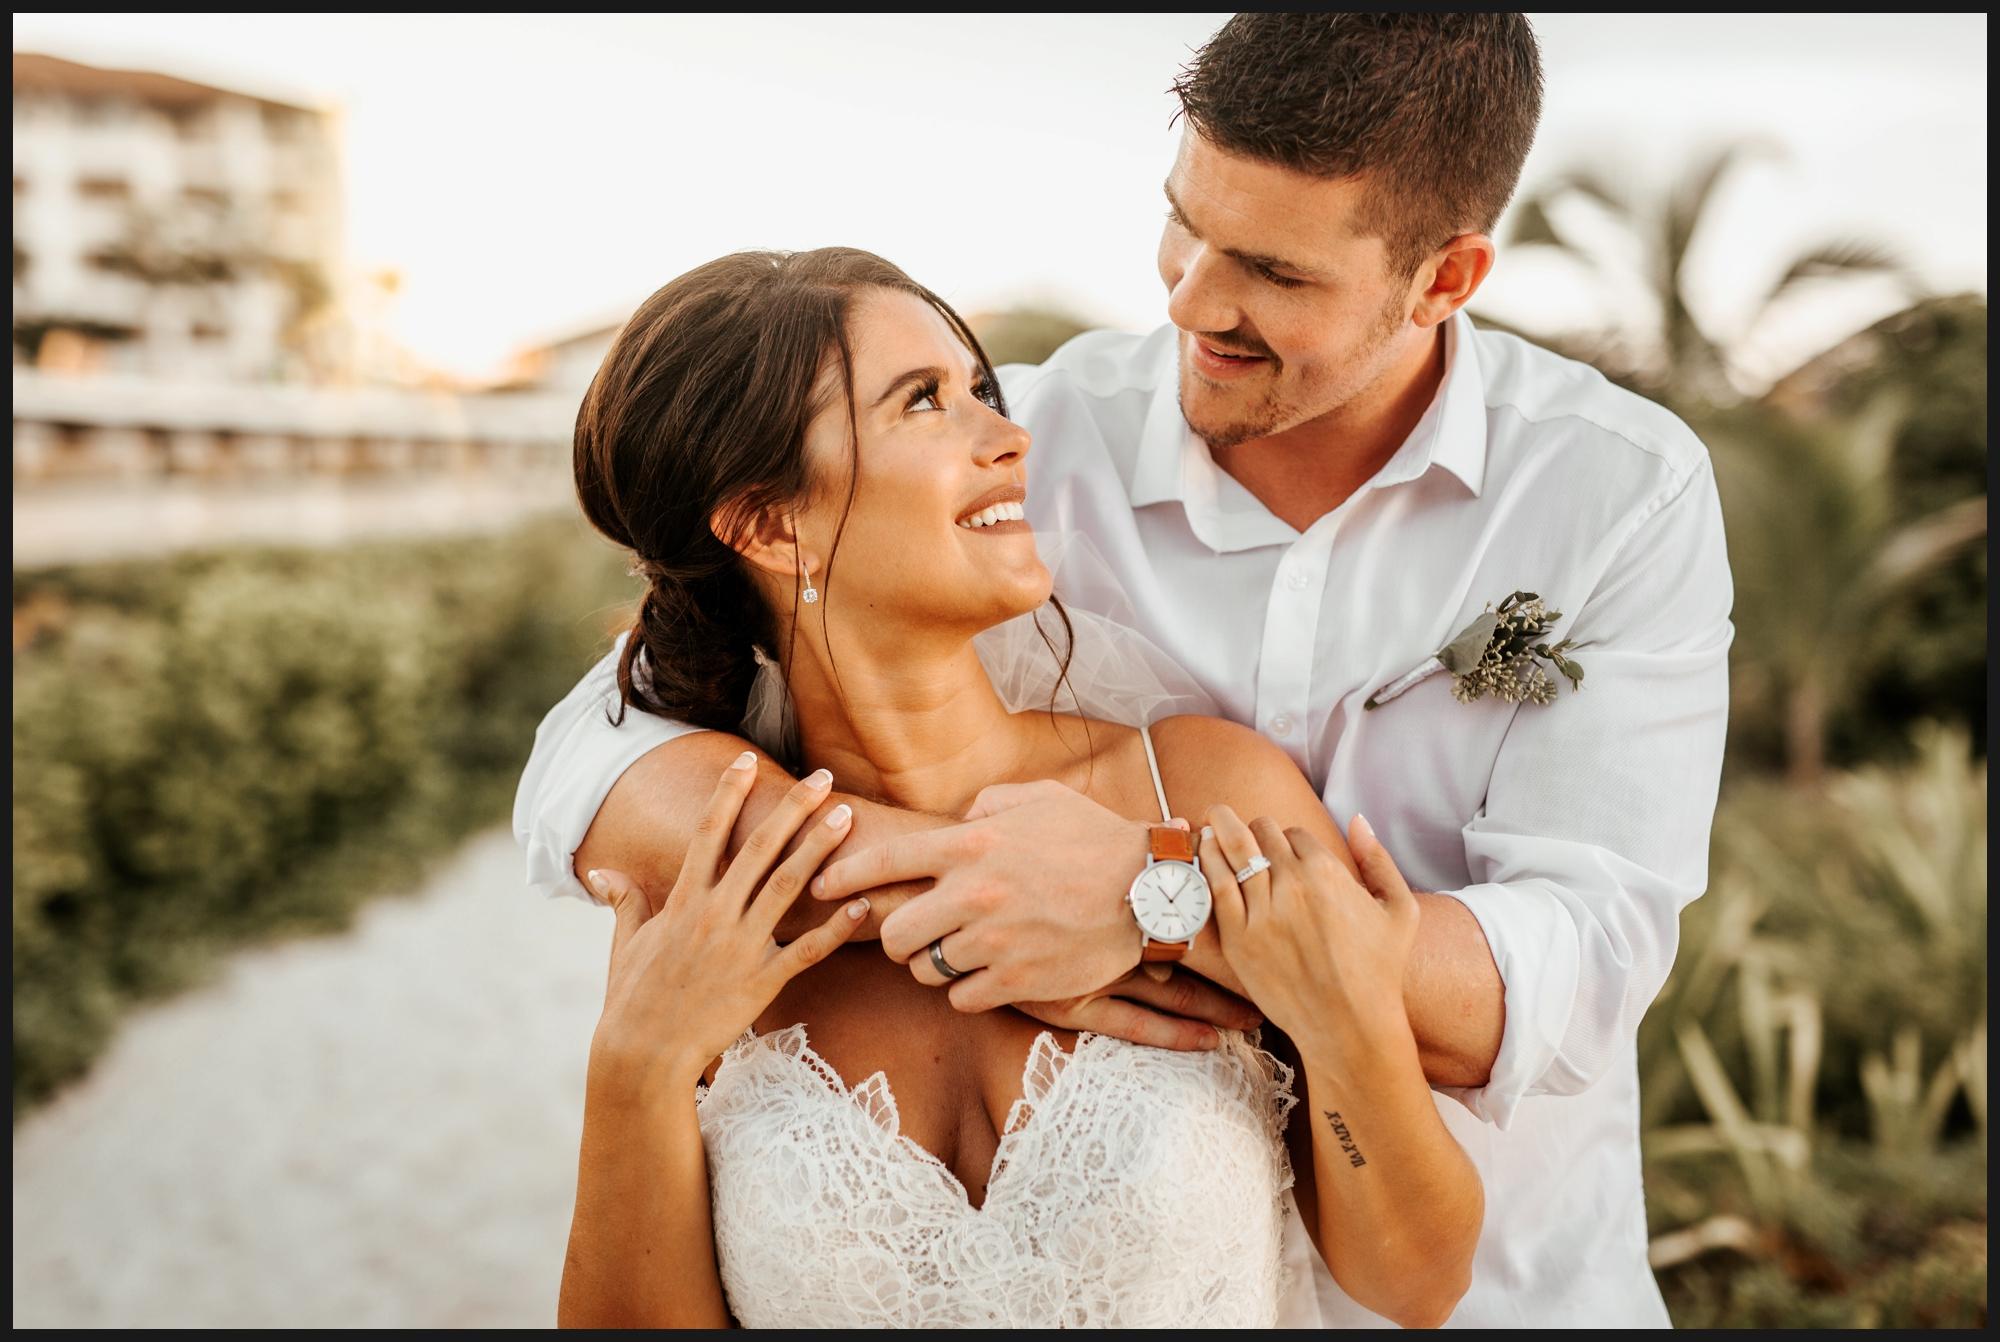 Orlando-Wedding-Photographer-destination-wedding-photographer-florida-wedding-photographer-bohemian-wedding-photographer_0524.jpg